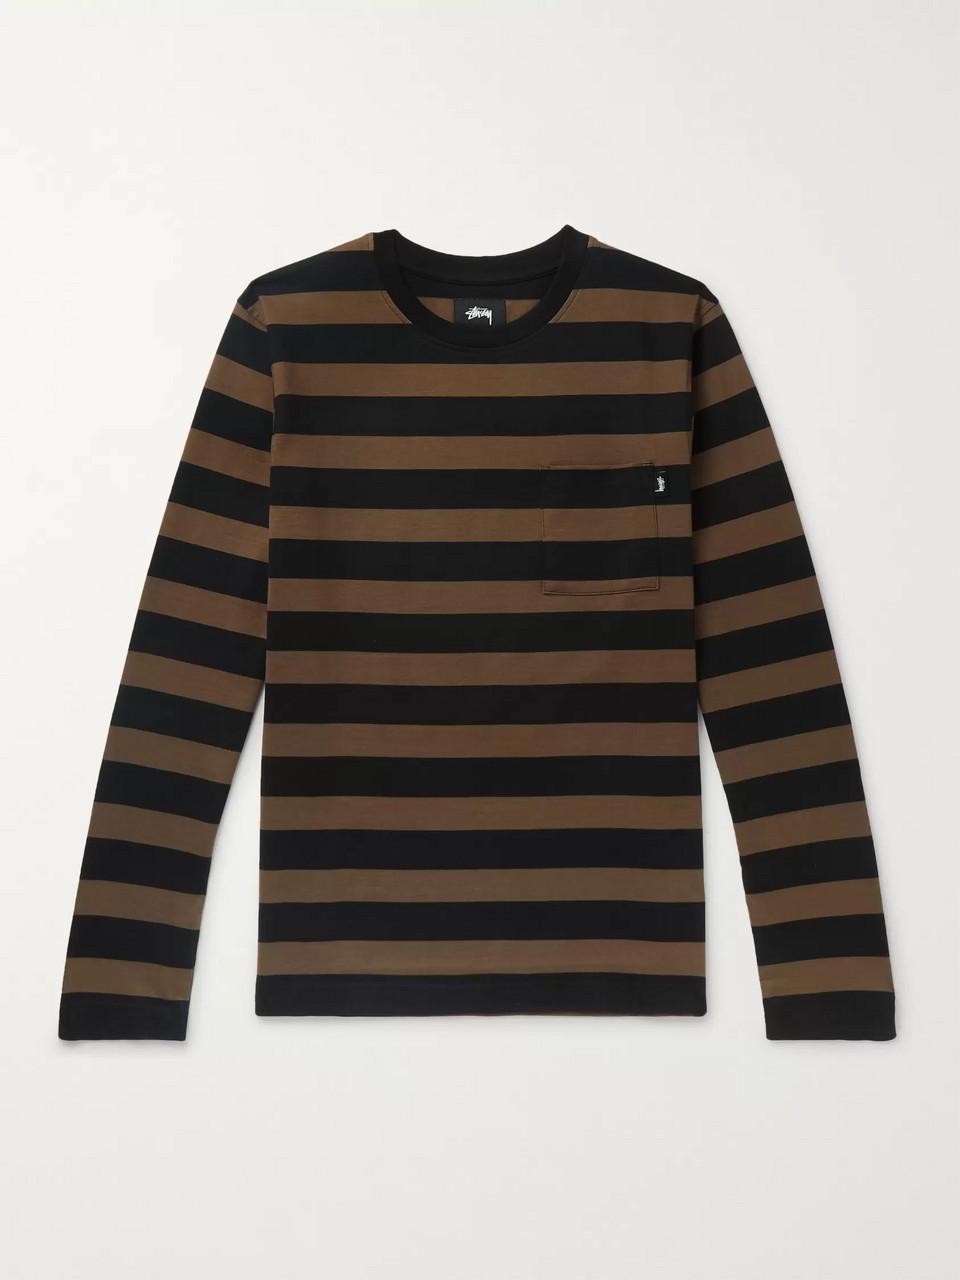 77eeac189a Brown Malcolm Striped Cotton-Jersey T-Shirt | Stüssy | MR PORTER